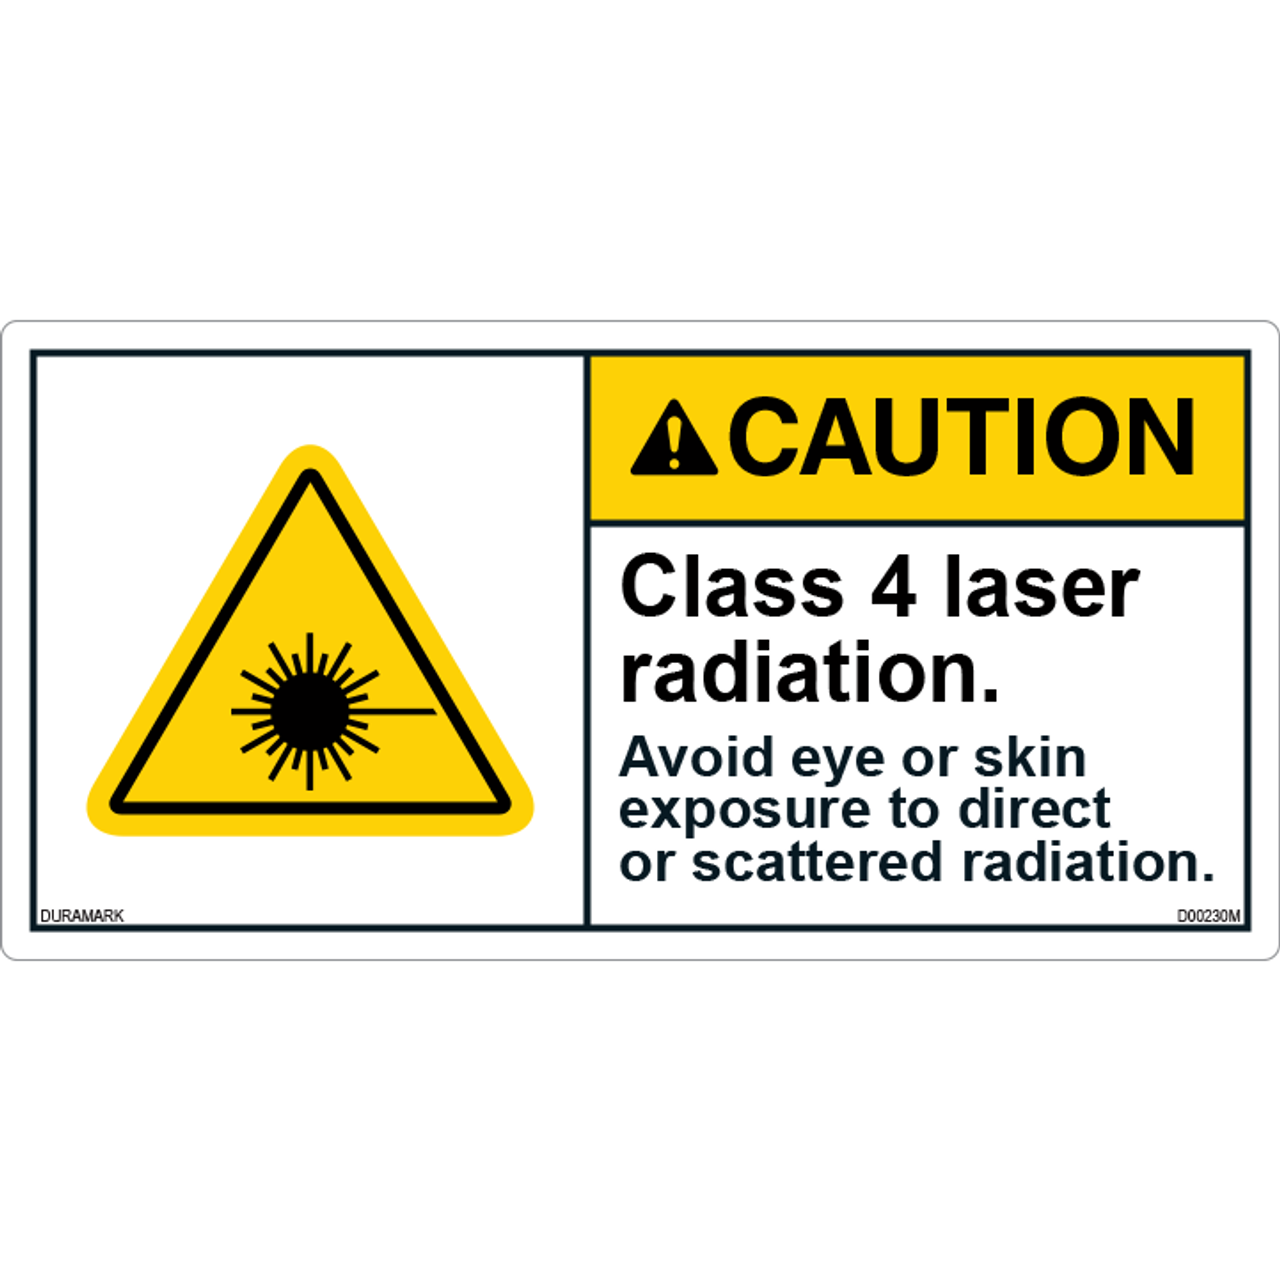 ANSI Safety Label - Caution - Laser Radiation - Class 4